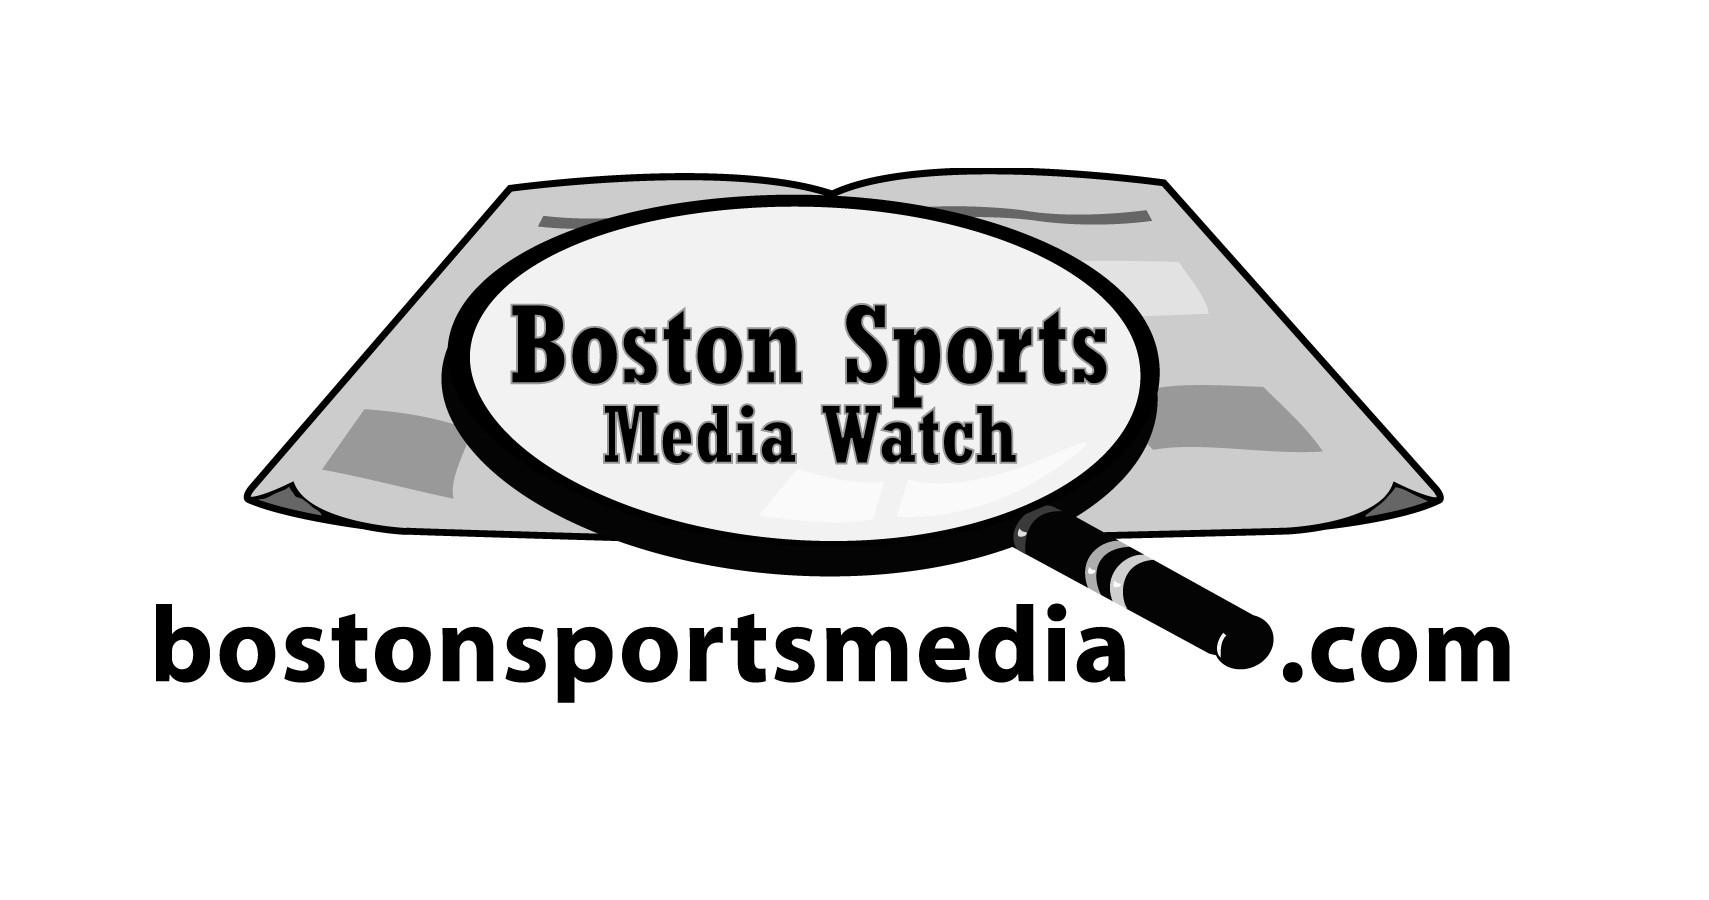 Boston Sports Media Watch